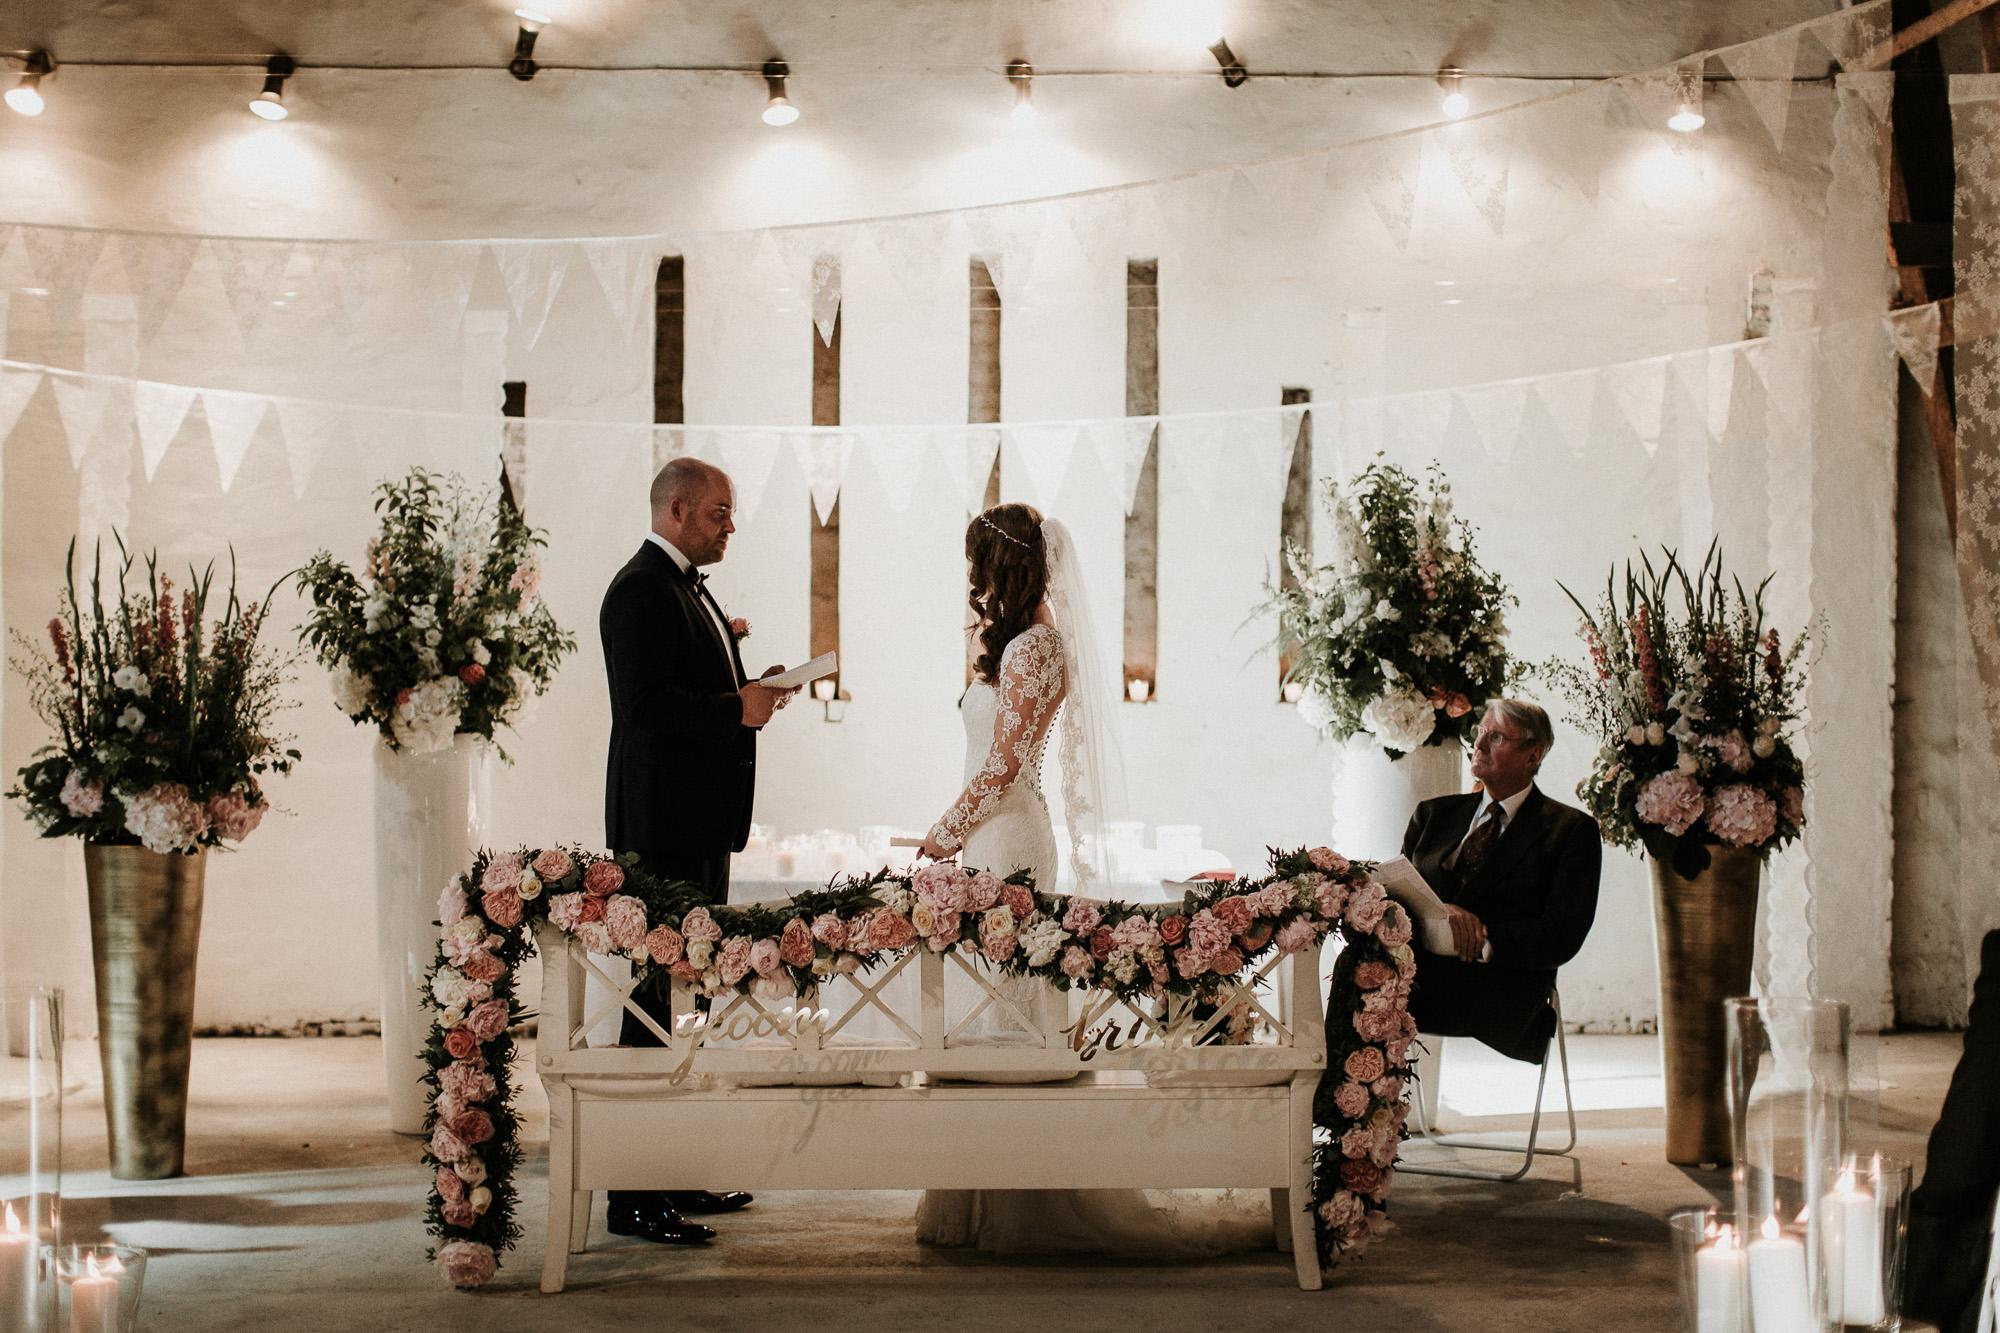 DanielaMarquardtPhotography_Hochzeitsfotograf_Düsseldorf_Köln_Mallorca_Bayern_Austria_Harz_Wedding_AileenundLennart_Weddingphotographer_Ibiza_Tuskany_Italien_Toskana_Portugal_Lissabon135